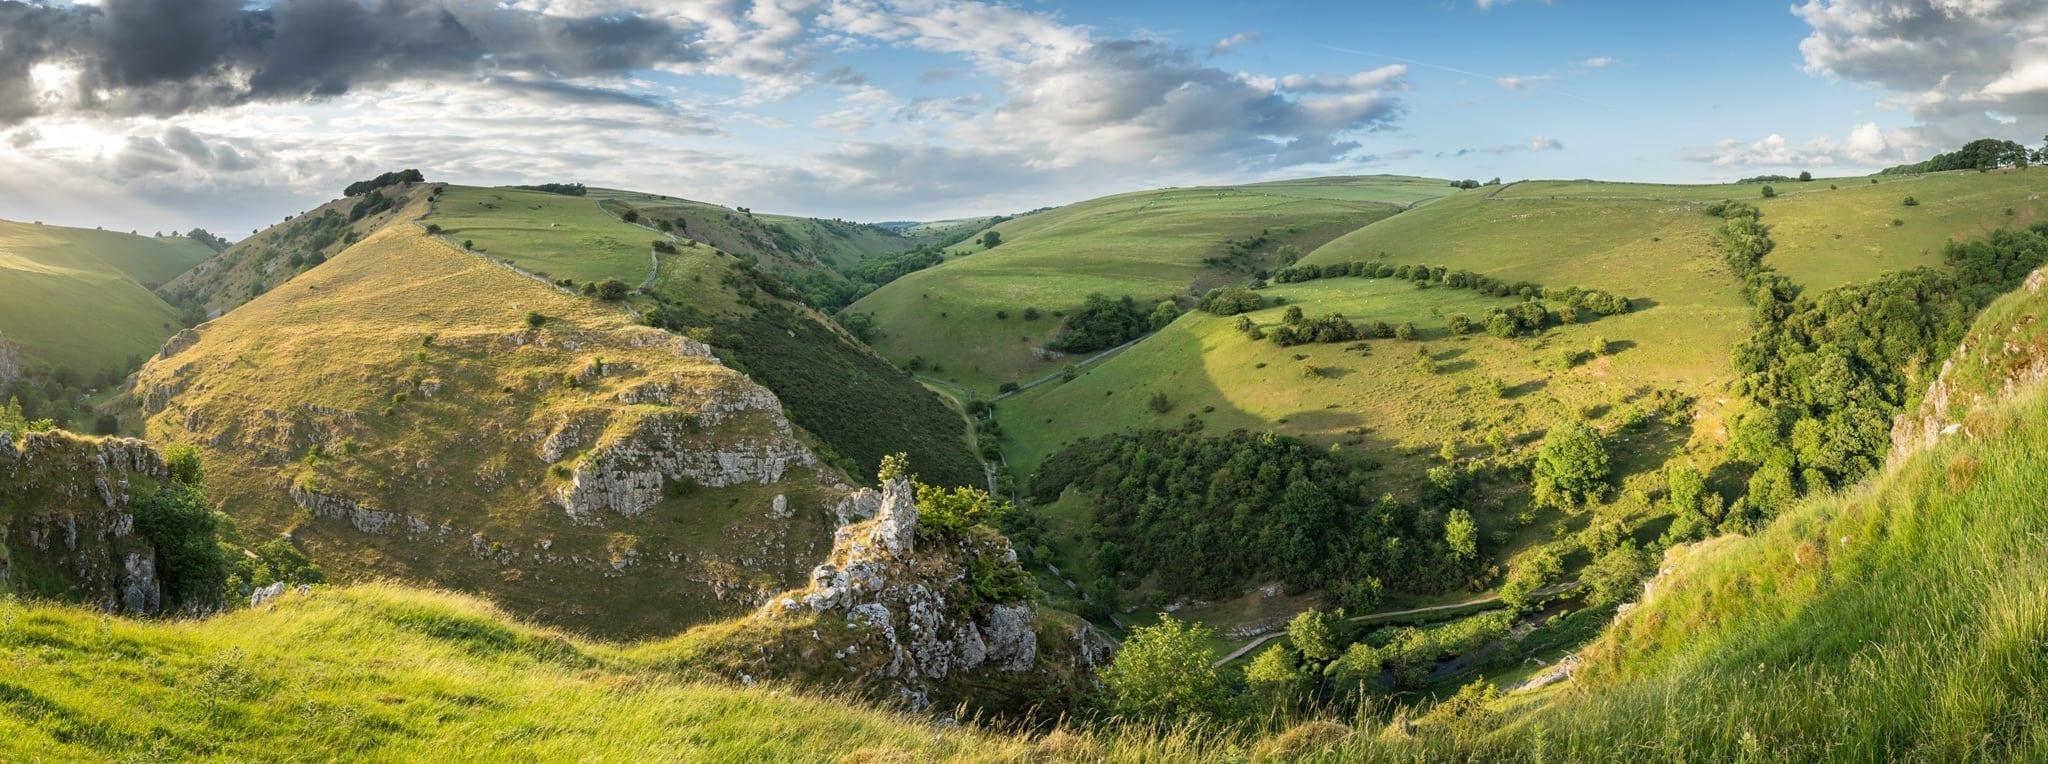 Peaseland Rocks Panoramic Susnet - Peak District Photography